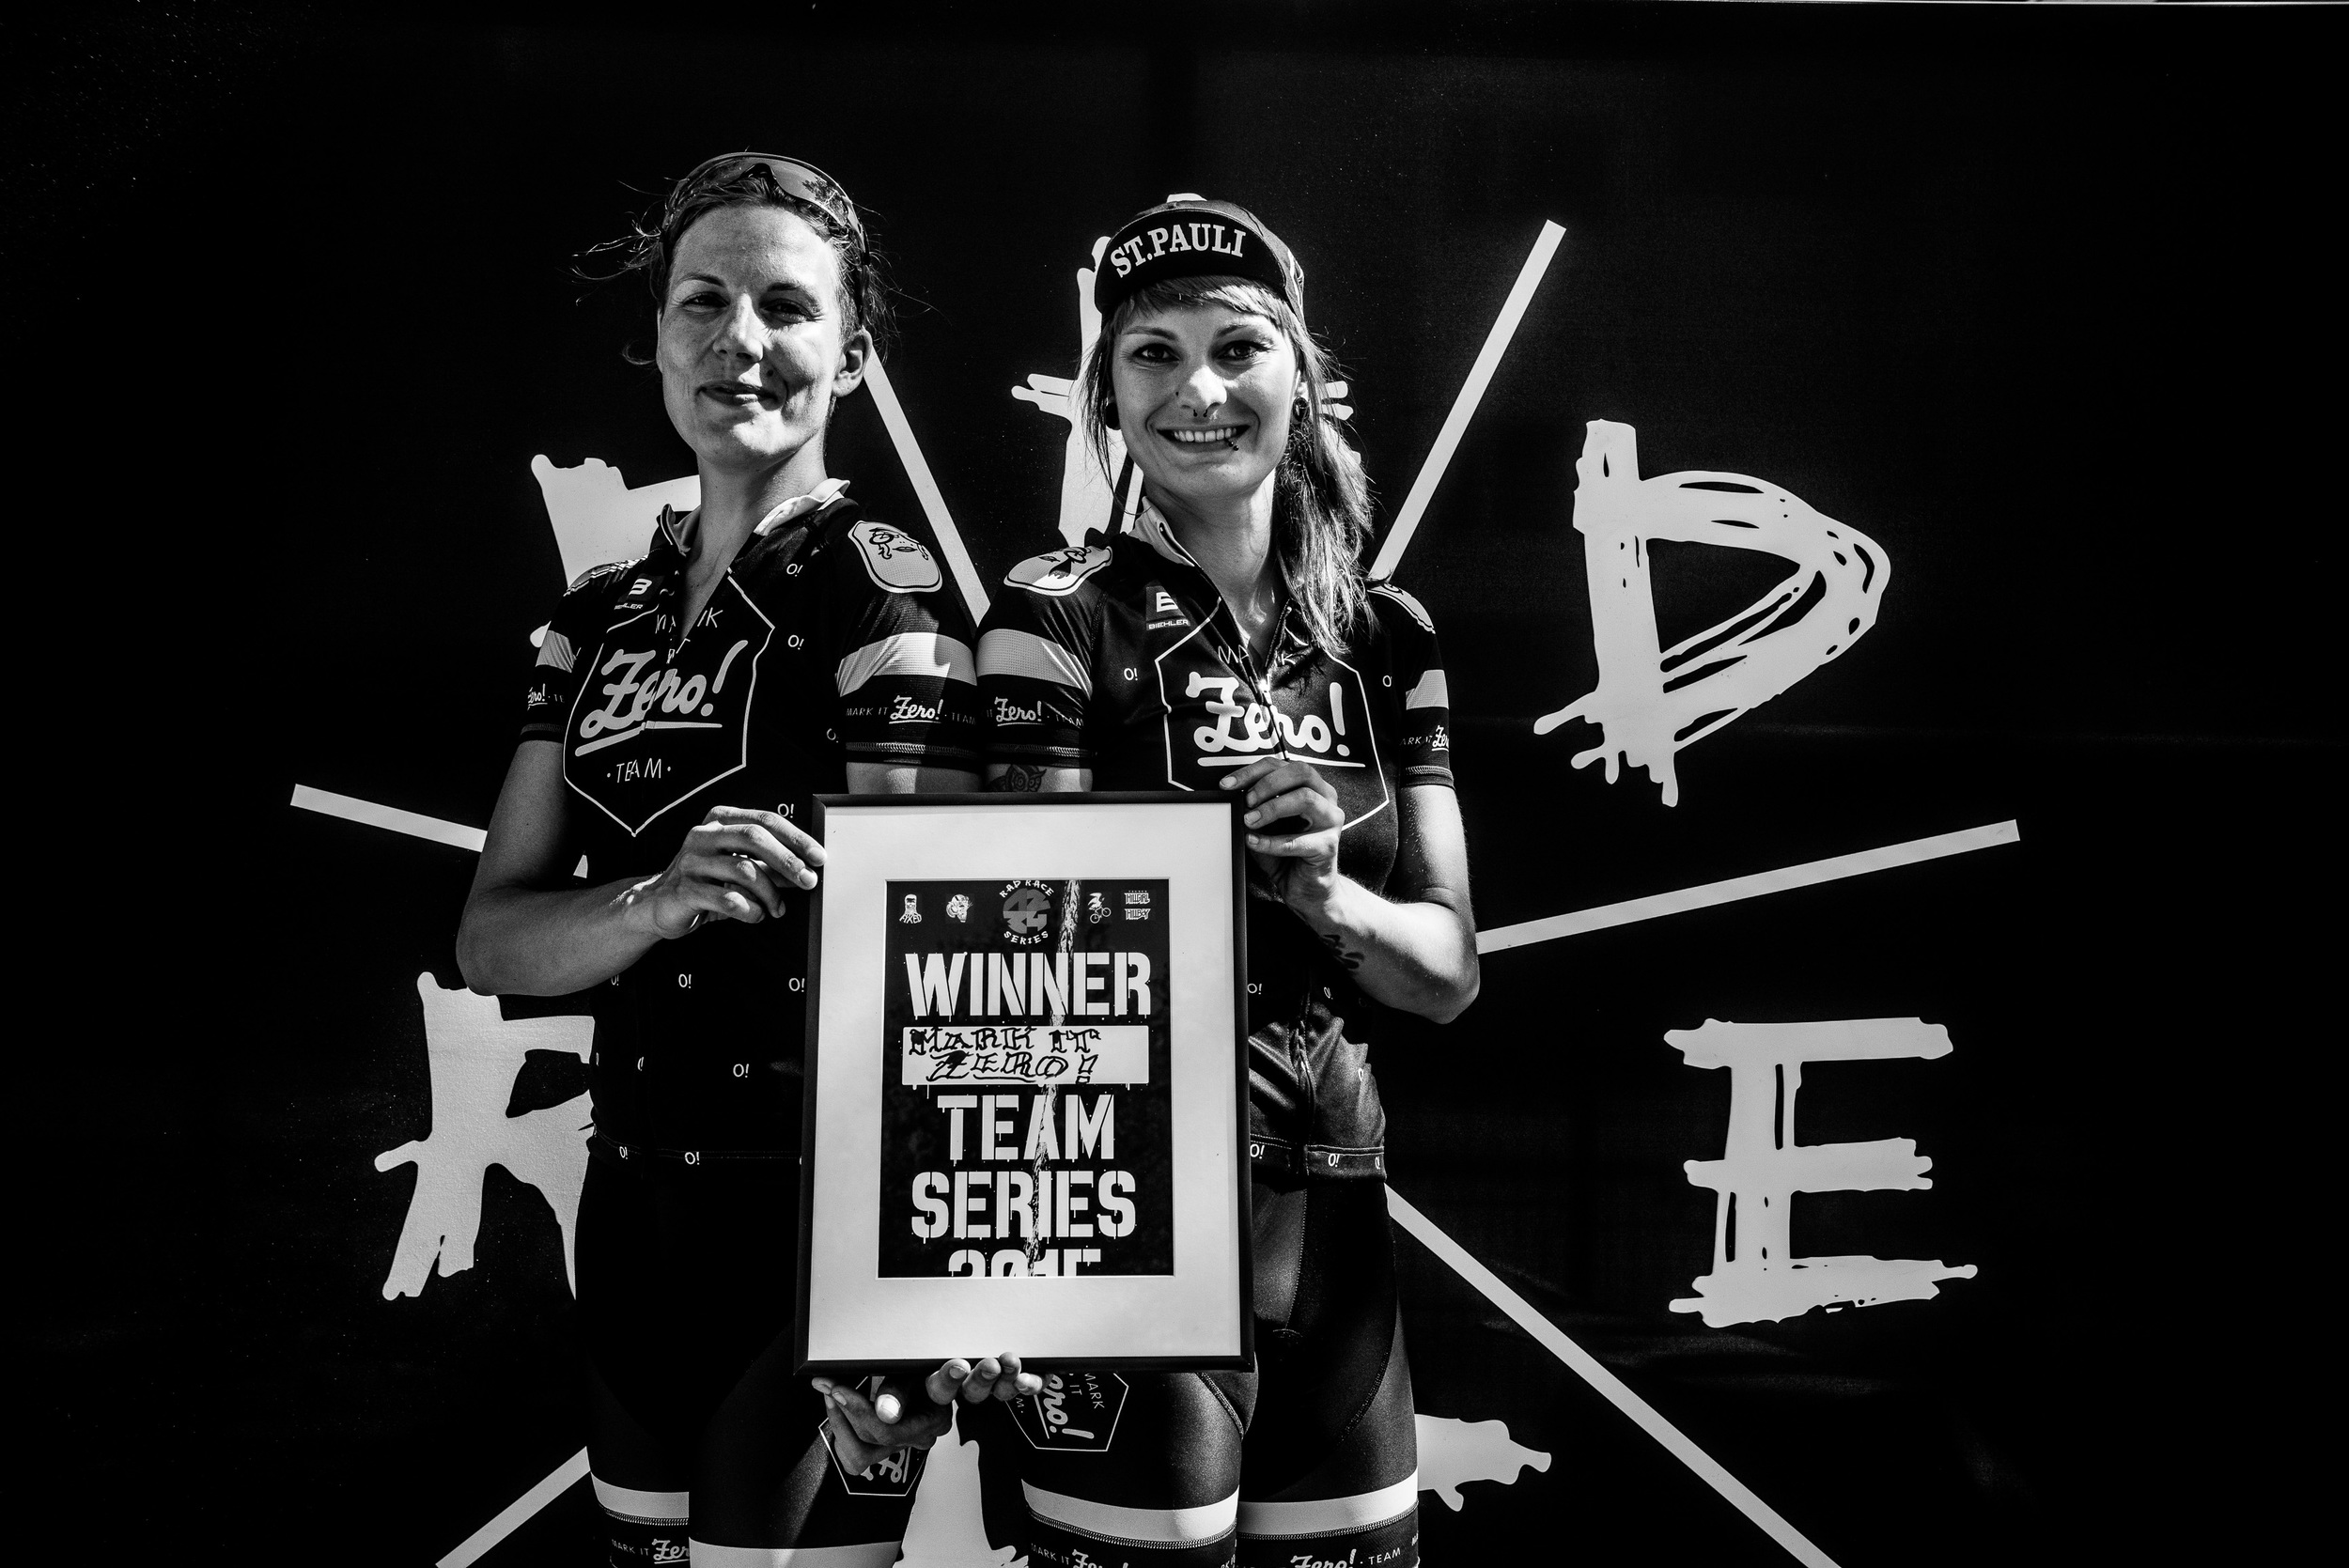 The best team 2015 of the rad race series. johanna jahnke & silja ketelsen from mark it zero! shot by drew kaplan.